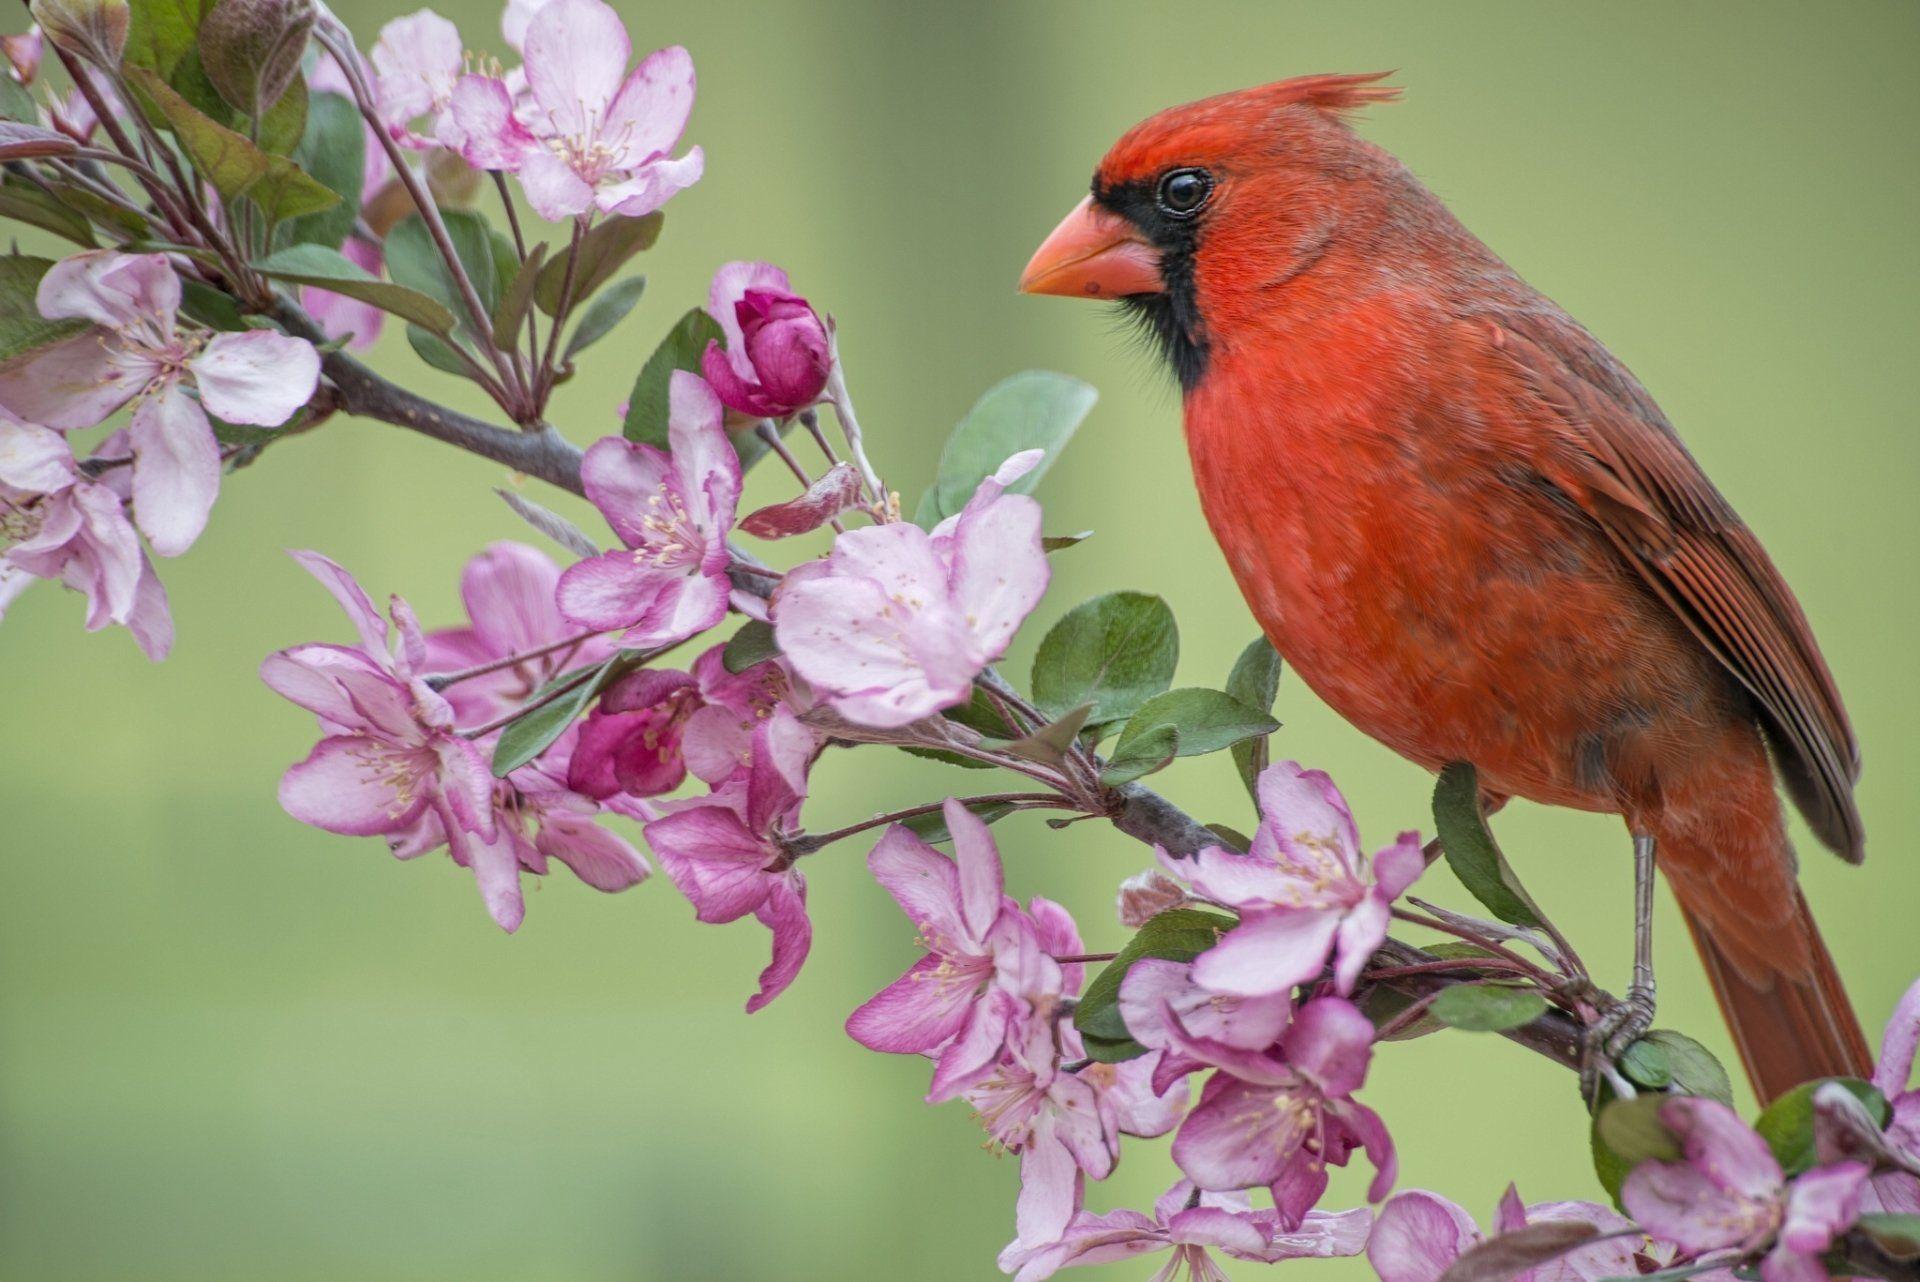 2048x1367 Cardinal on Flower Branch Wallpaper Background